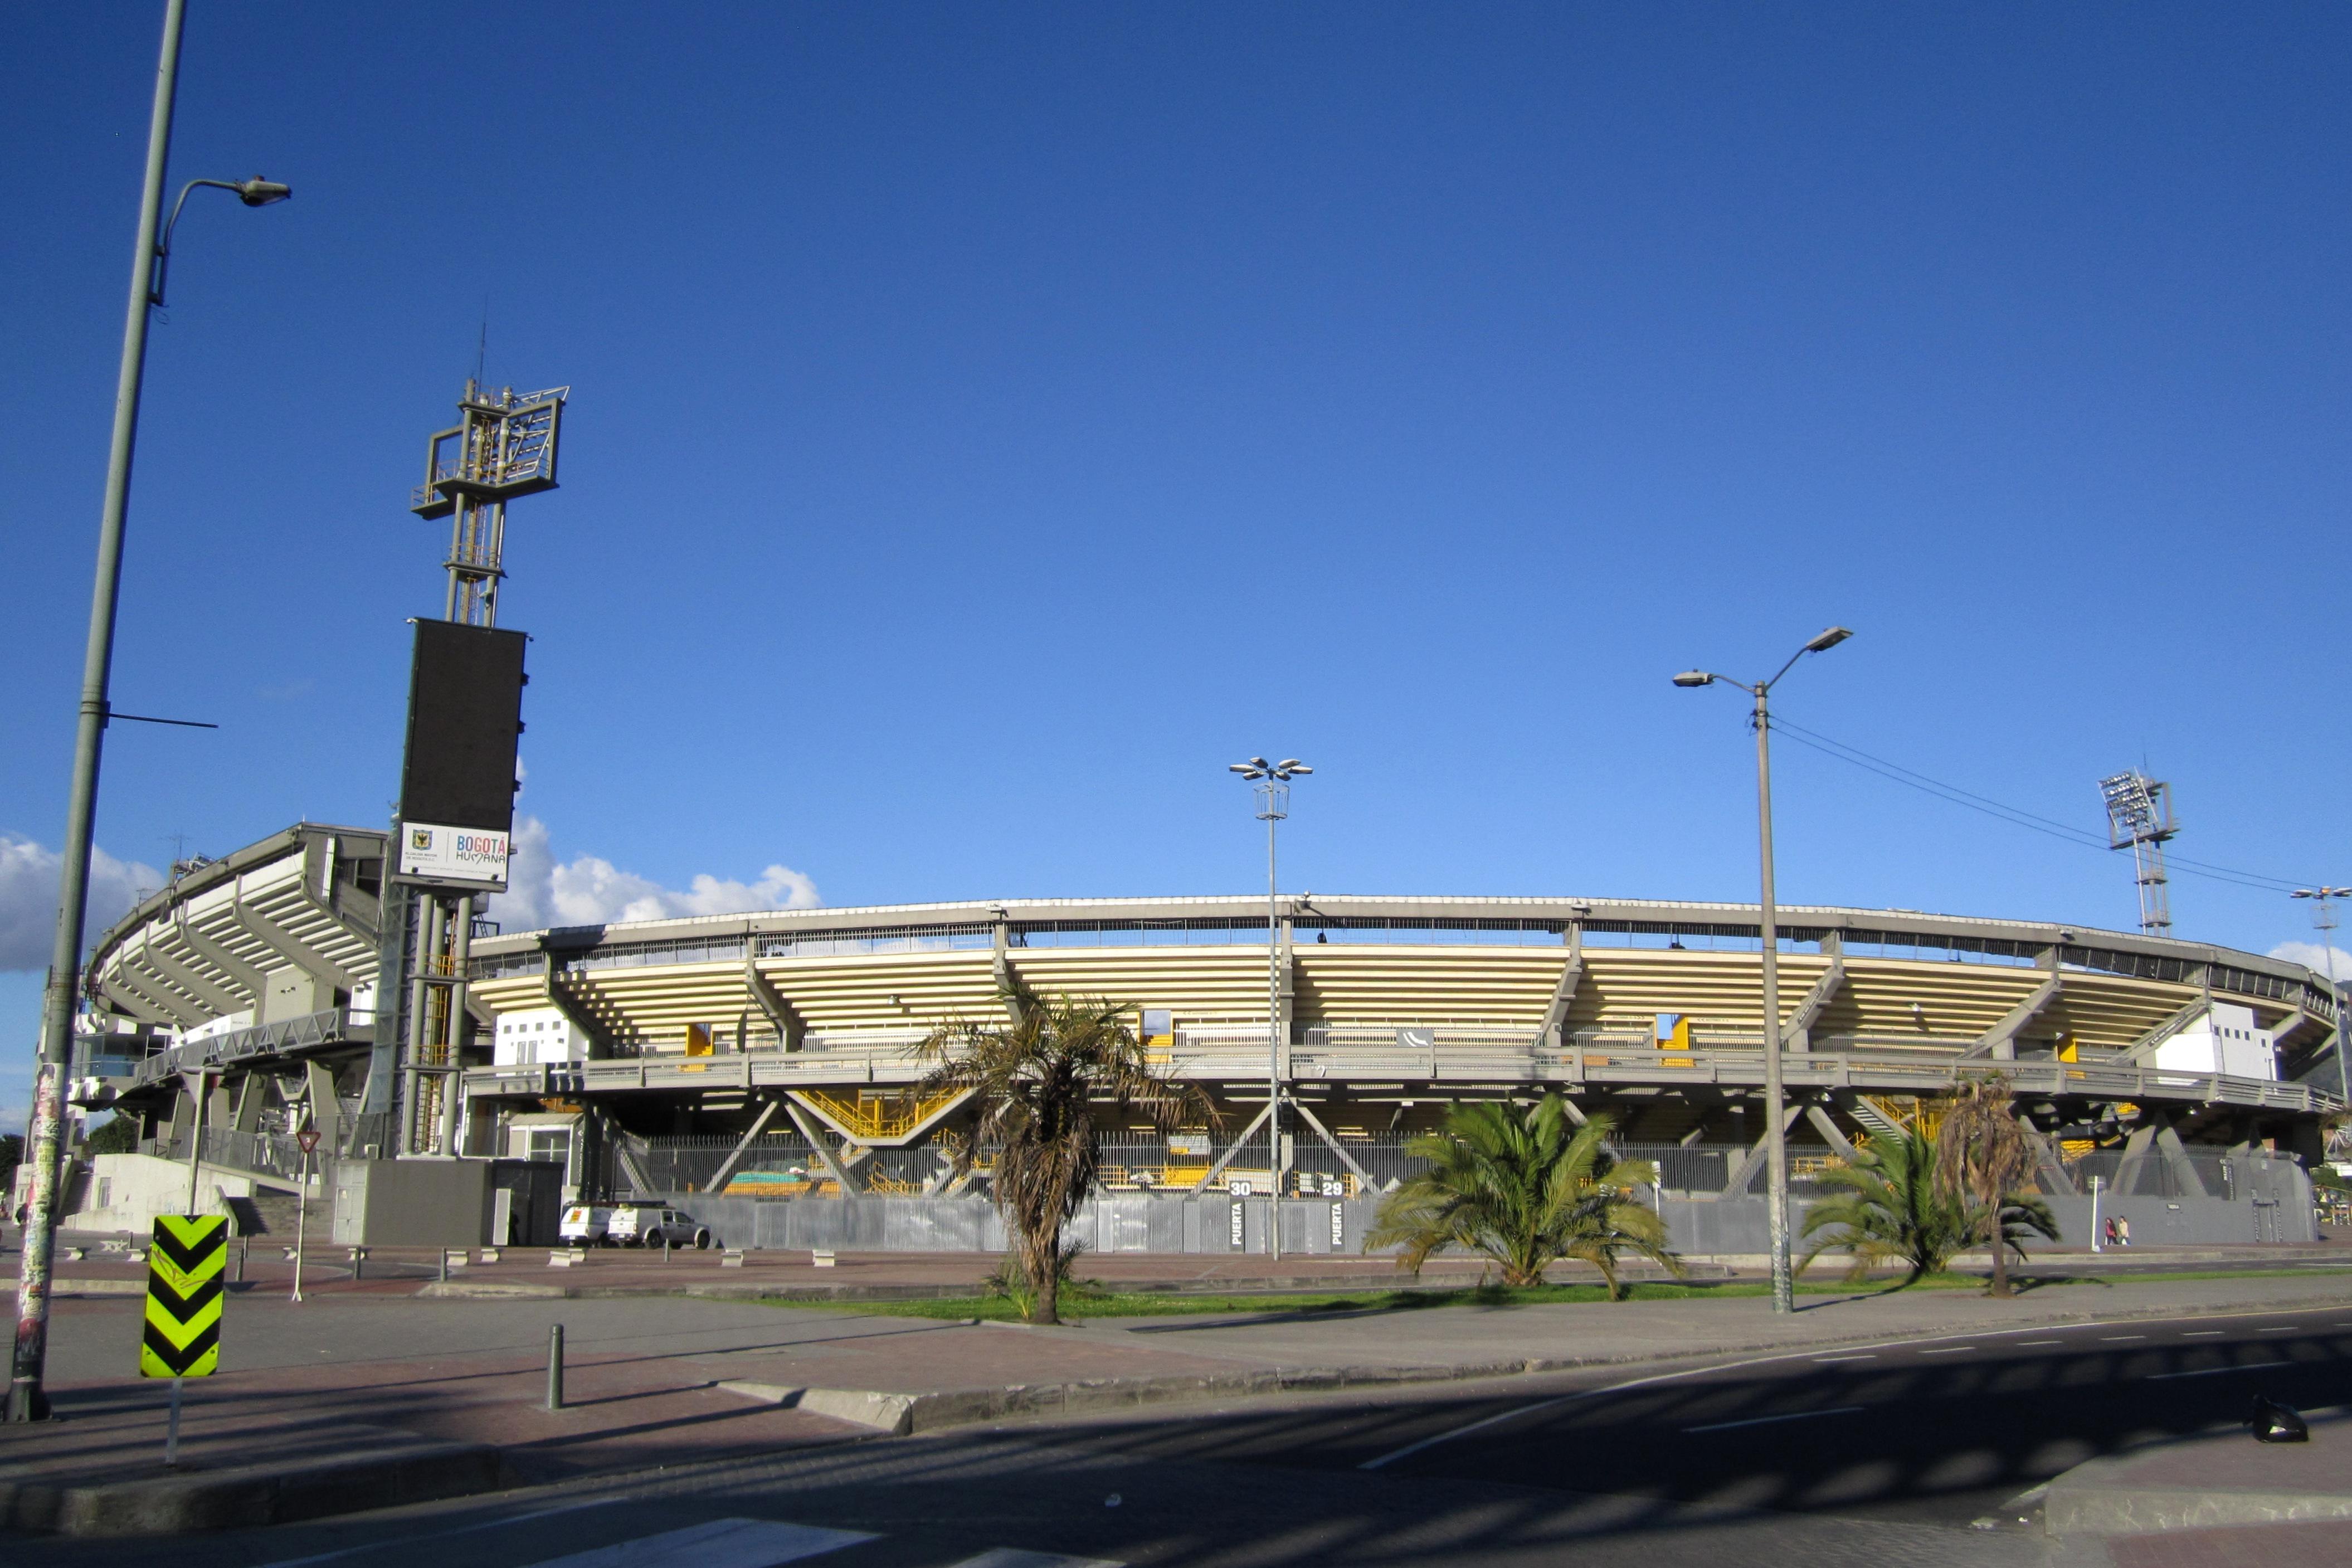 https://upload.wikimedia.org/wikipedia/commons/c/ce/Estadio_El_Campin_costado_suroccidental.JPG